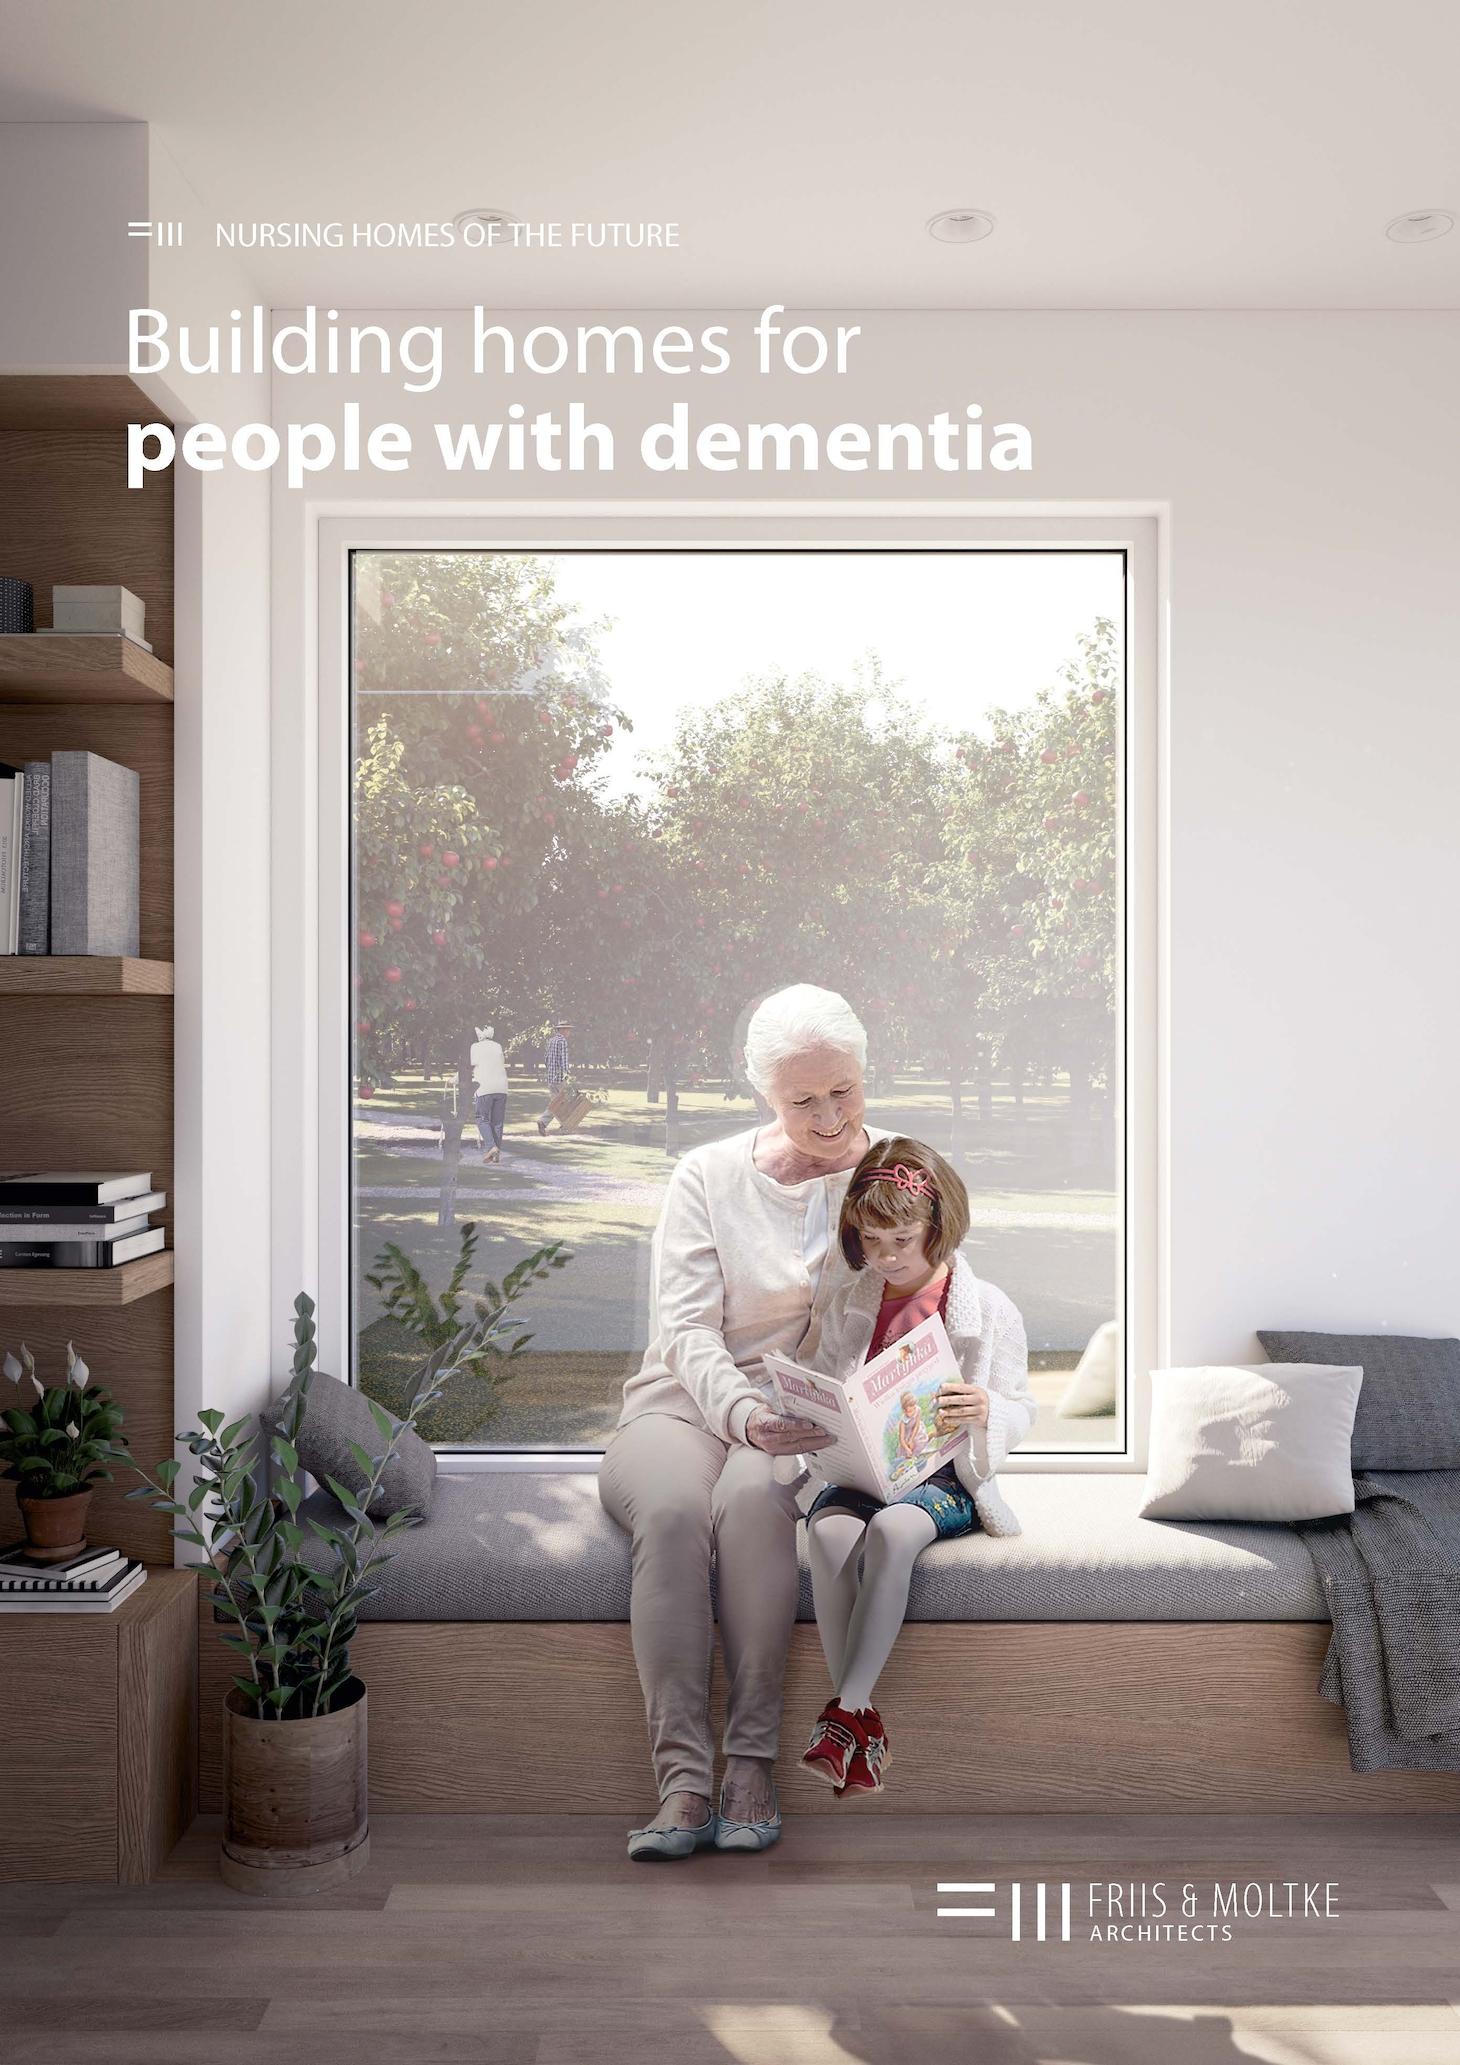 Nursing Homes of the Future